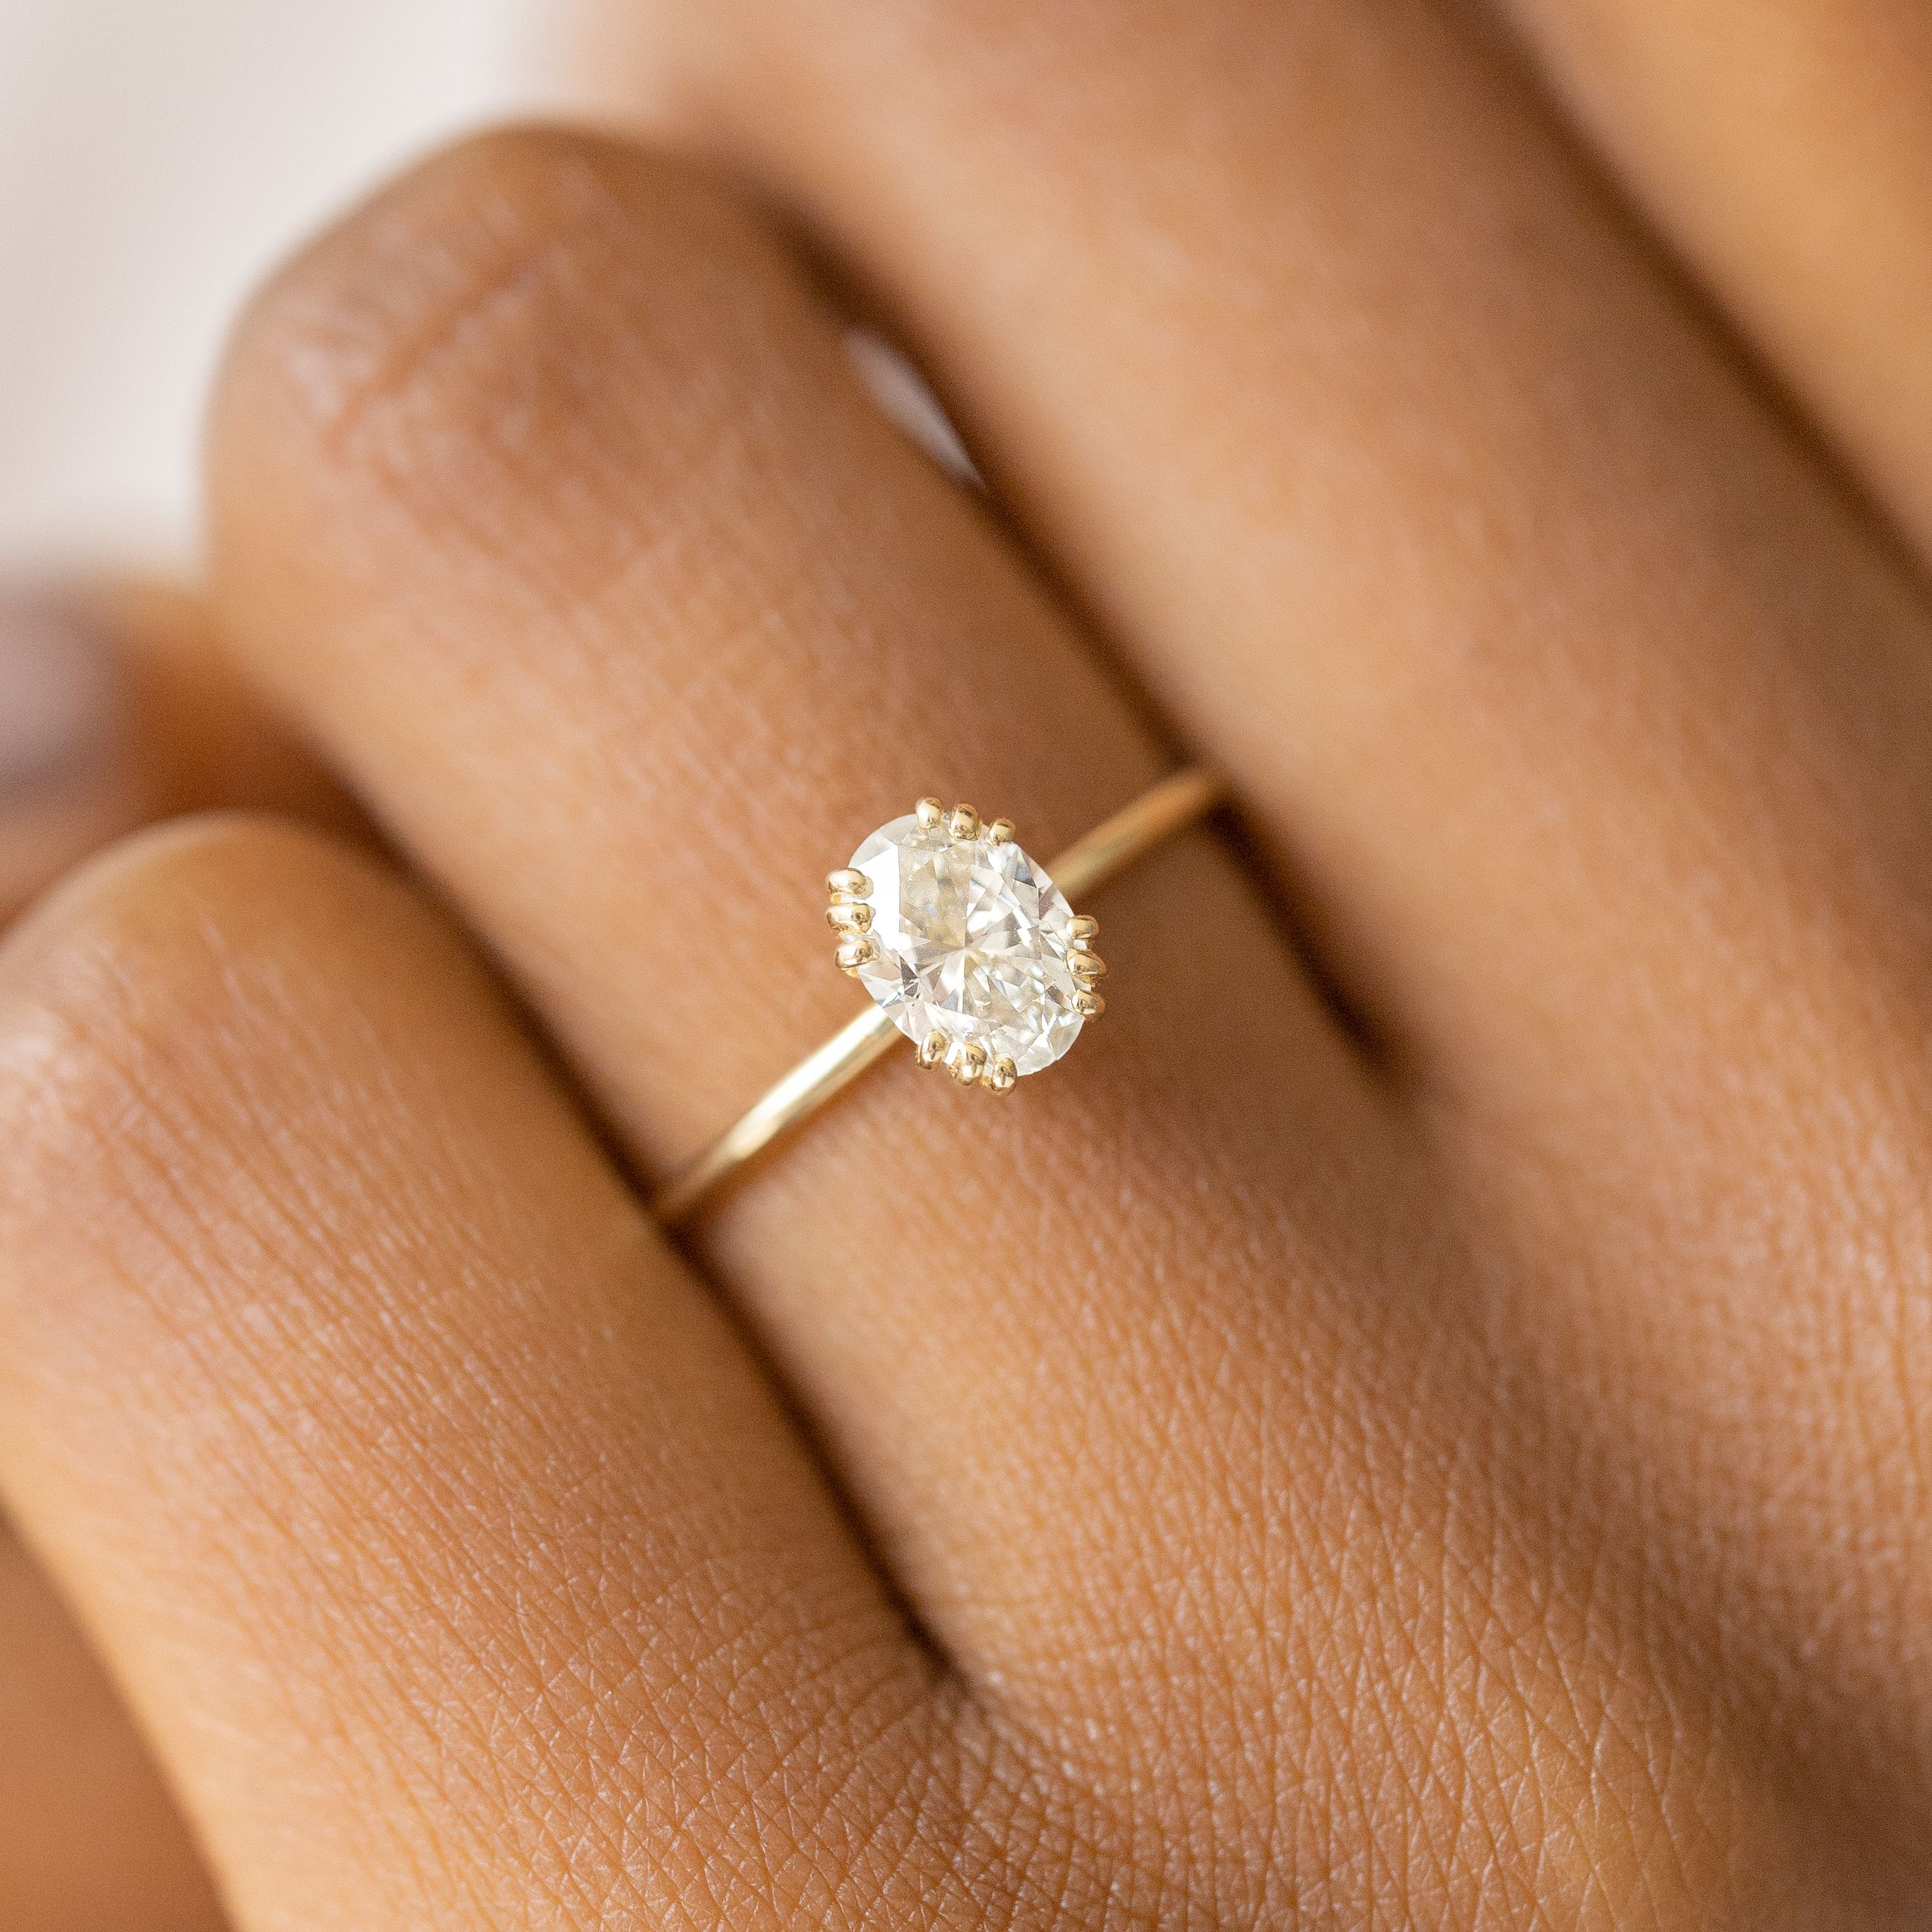 Unveiled Ring 0 7ct Oval Diamond Morganite Engagement Ring Set Diamond Wedding Bands Prong Engagement Rings